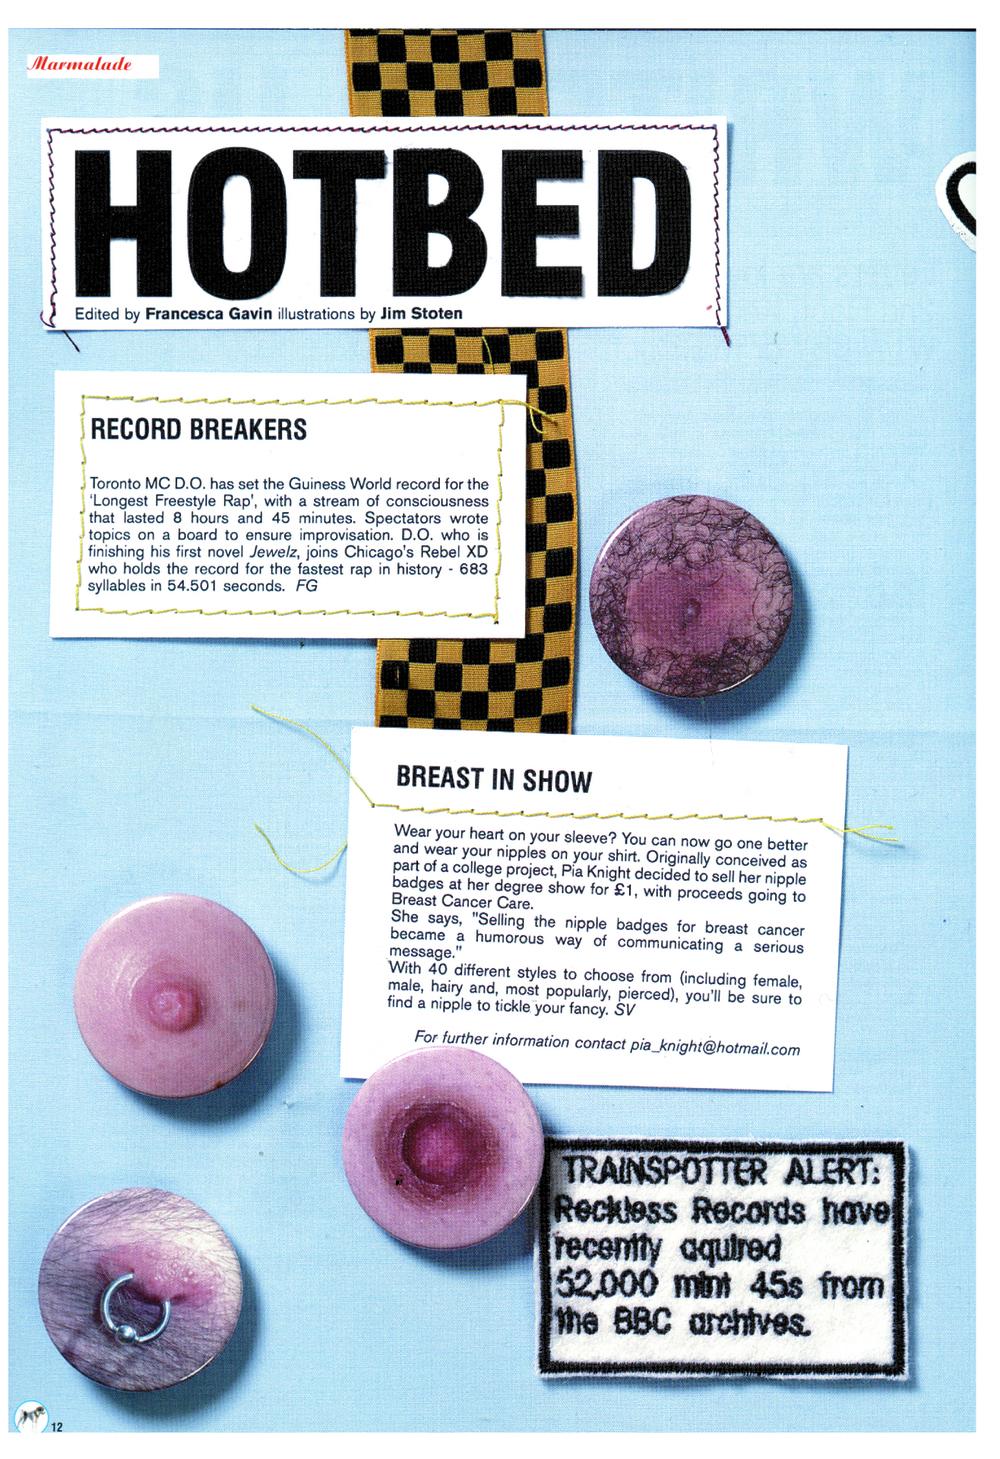 Marmalade nipple article.jpg